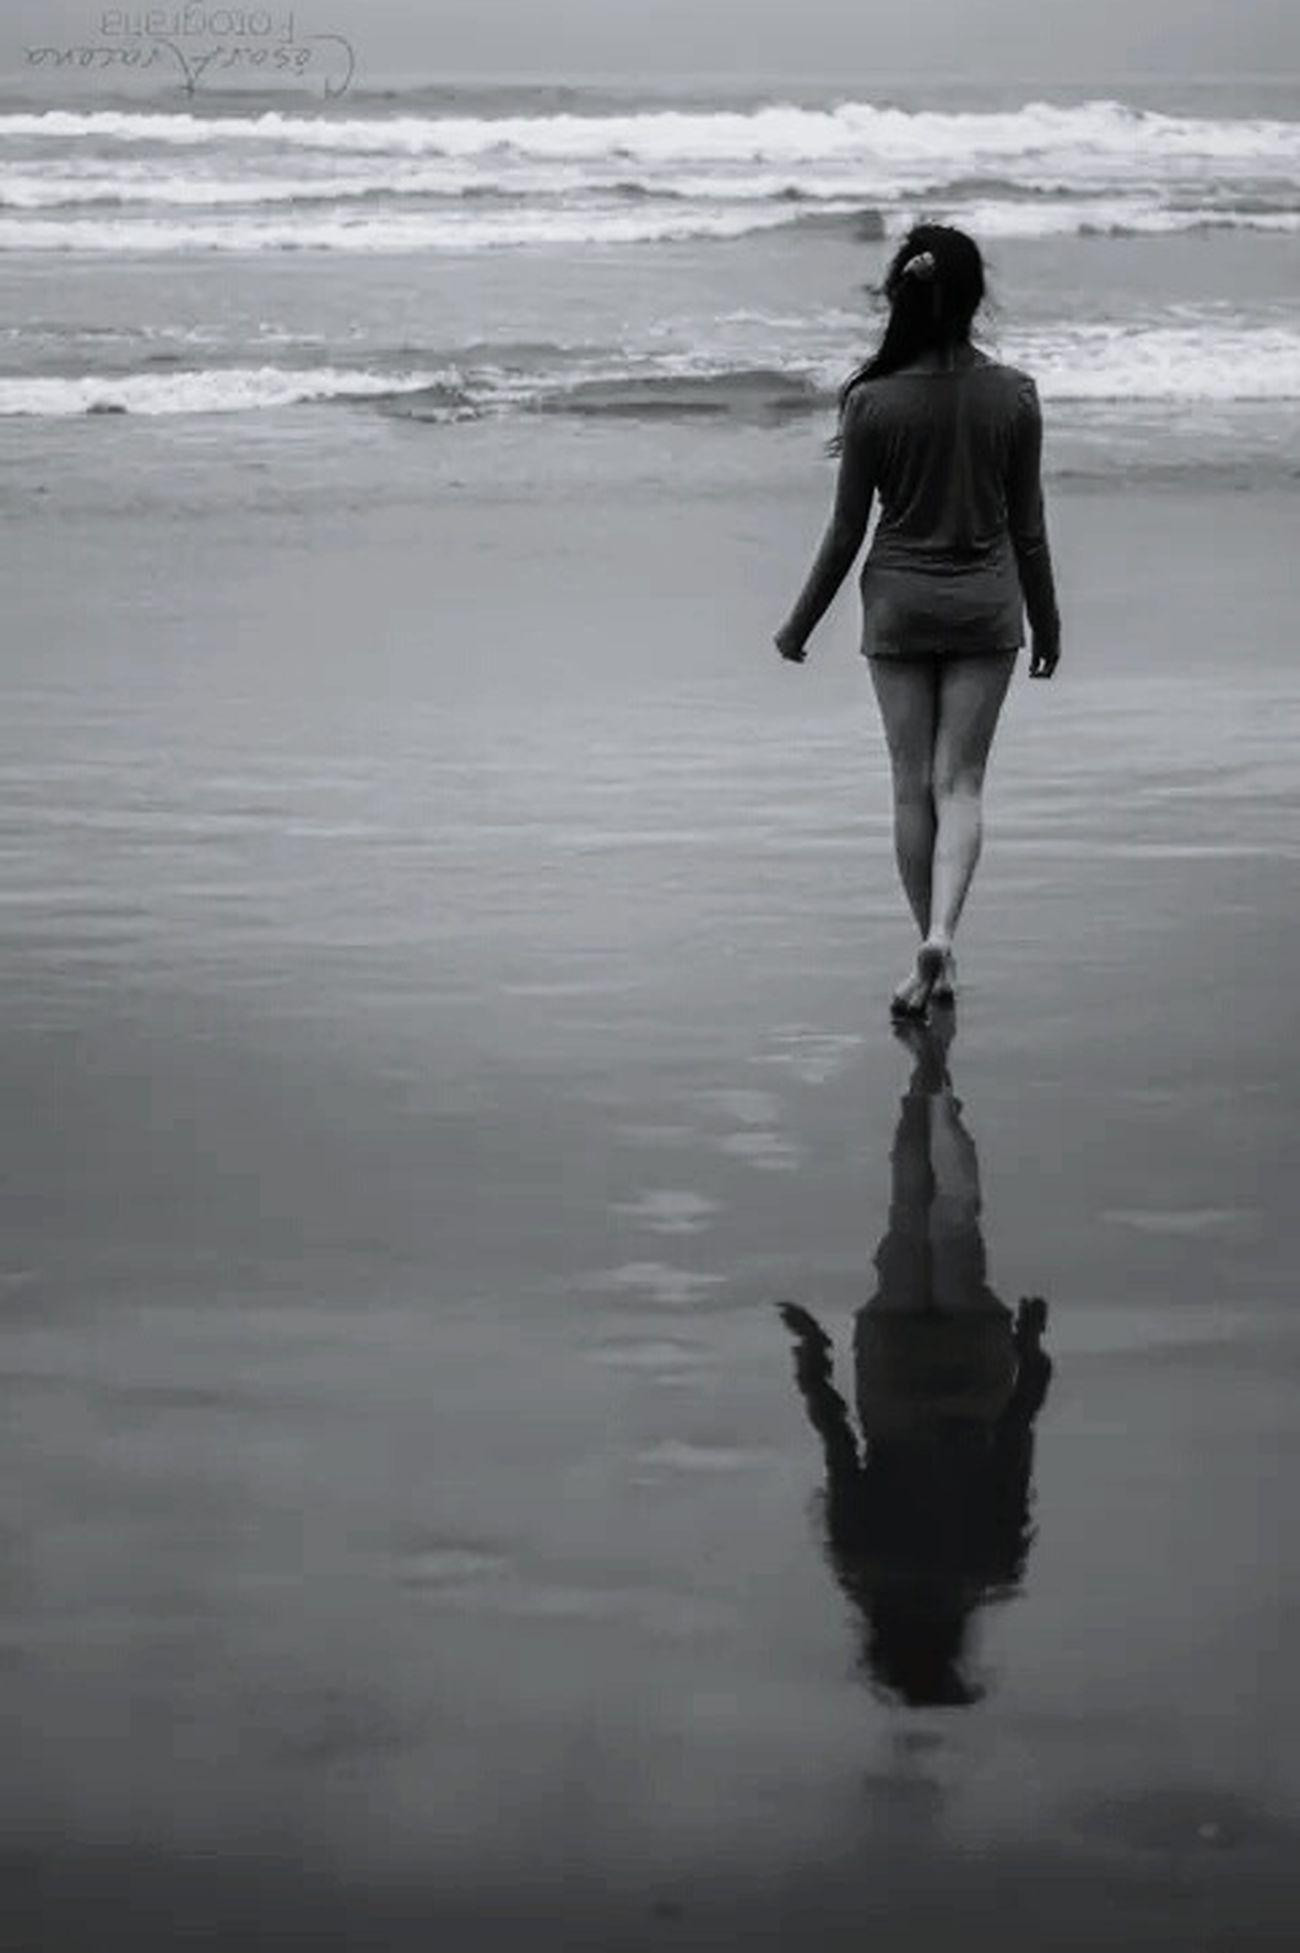 Walk away. Blackandwhite Summer Beach Şūr Chile Me Wonderful Photo